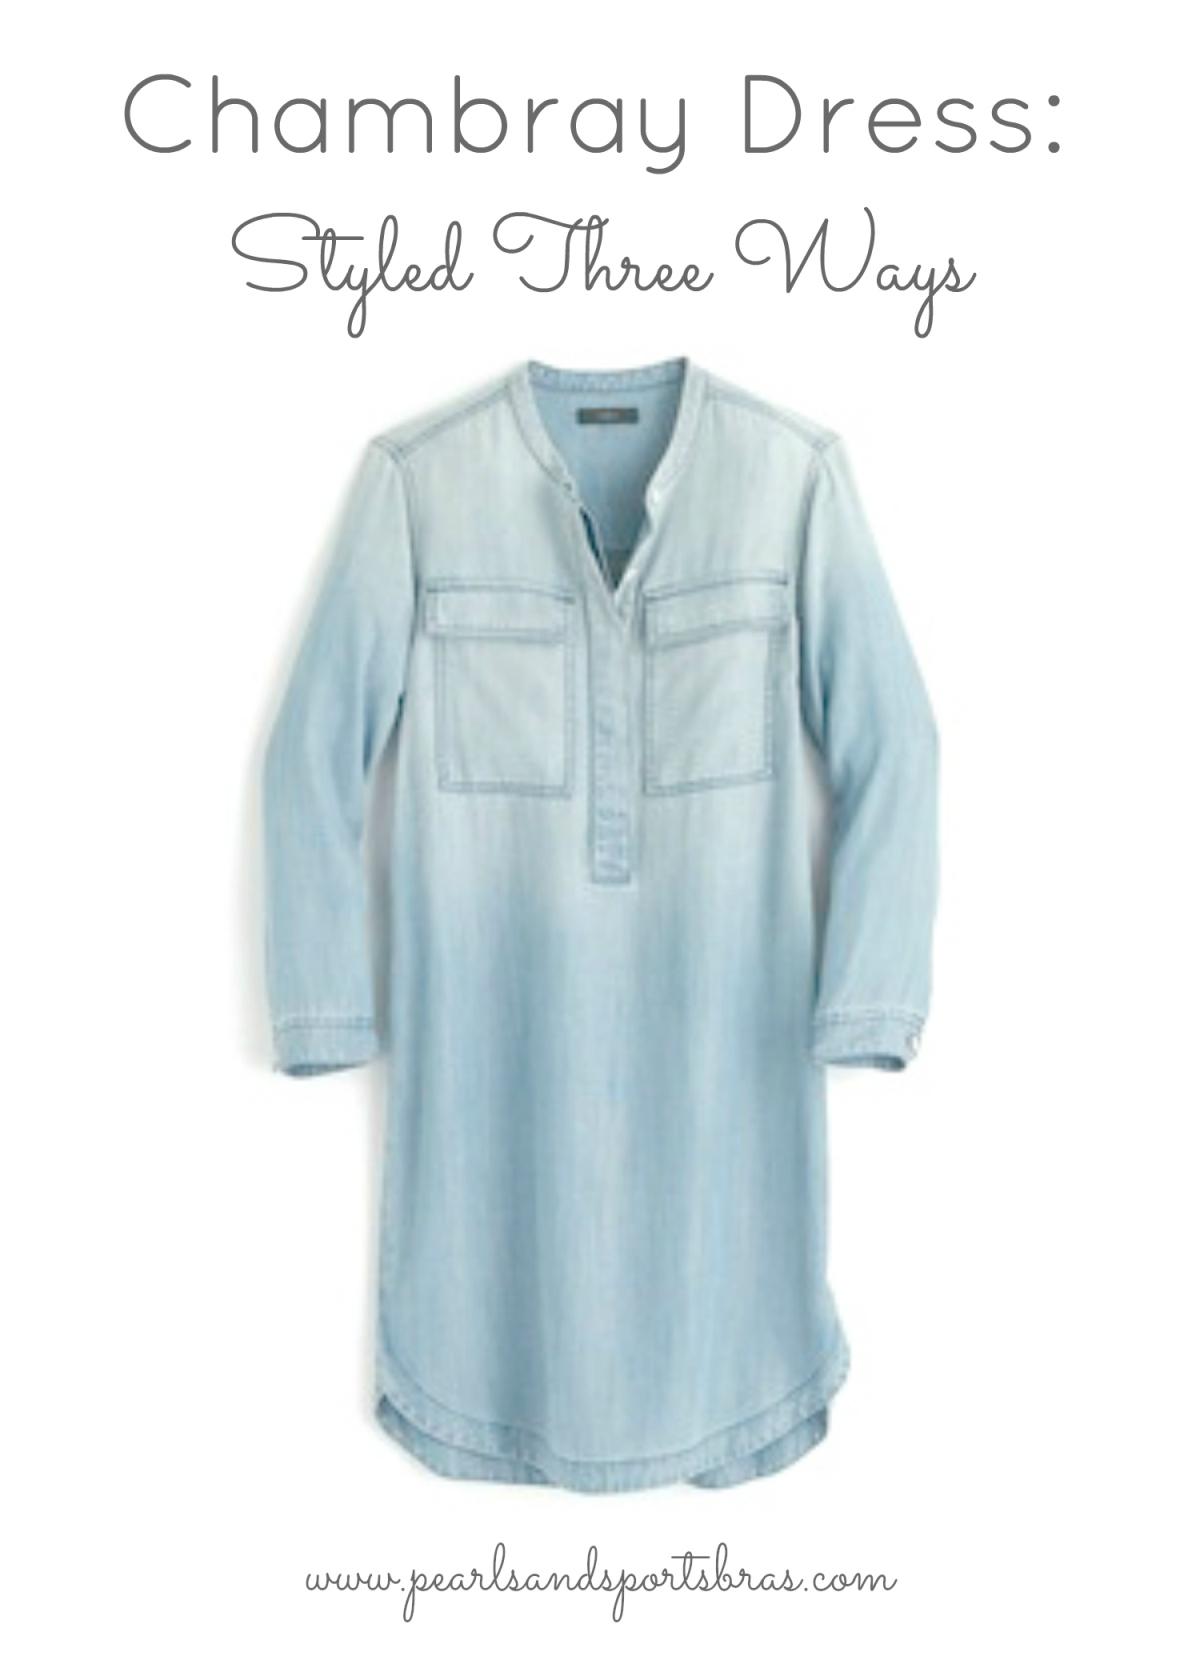 Chambray Dress: Styled Three Ways |www.pearlsandsportsbras.com|